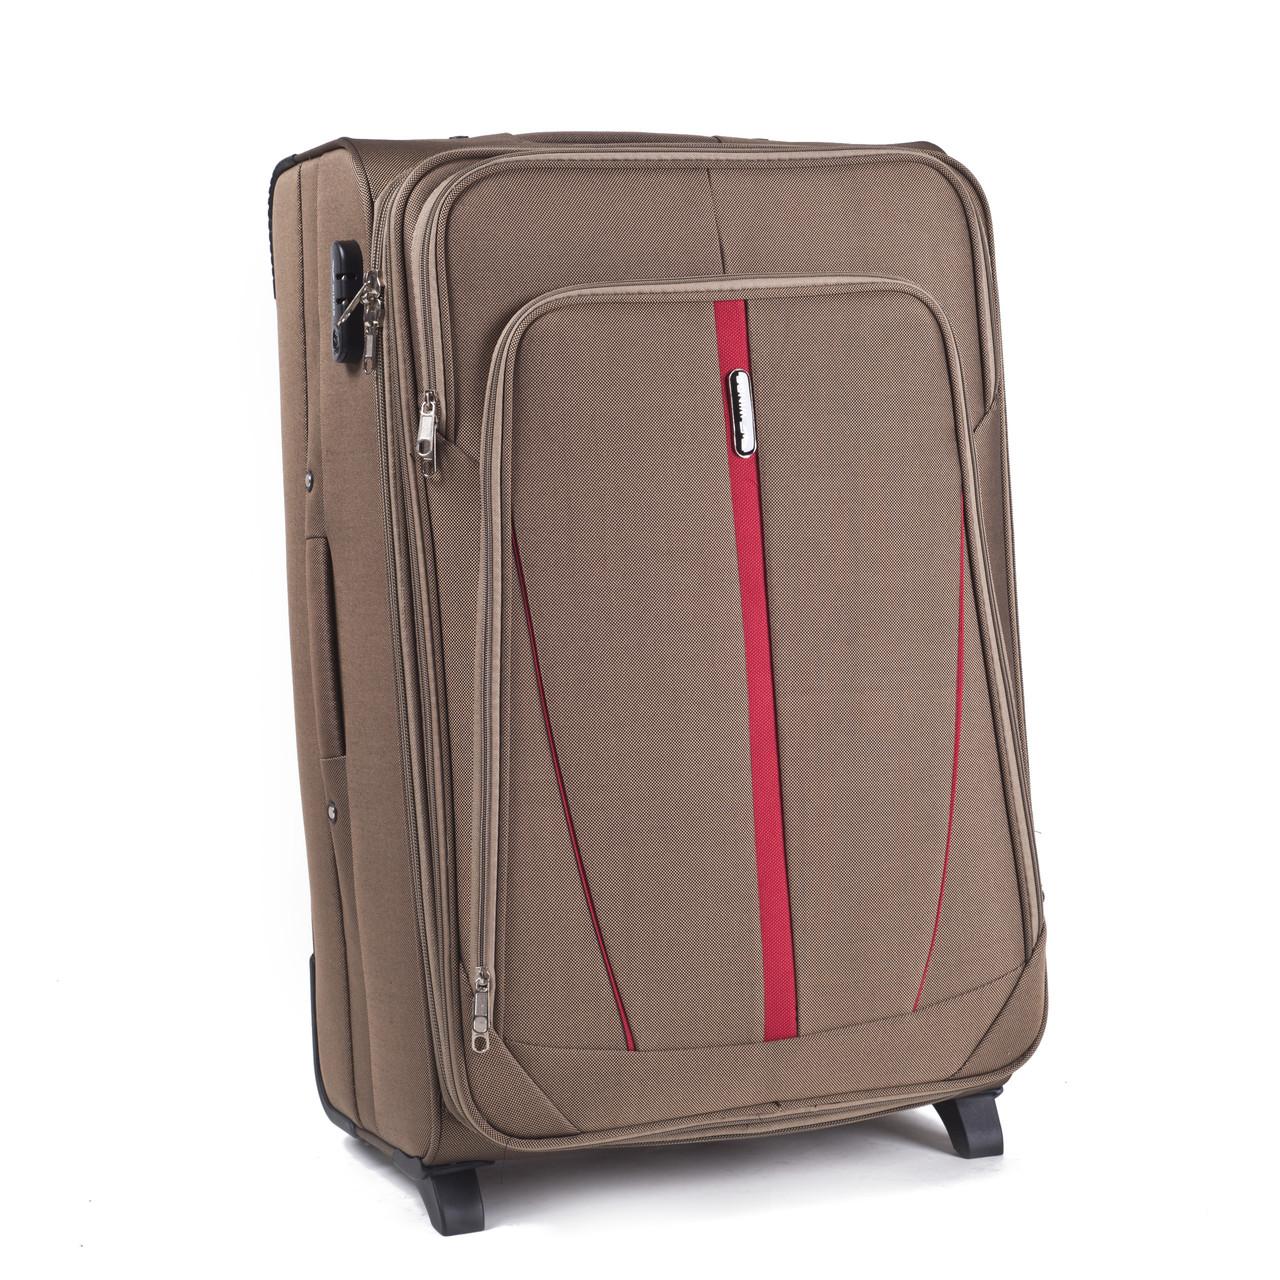 Малый тканевый чемодан Wings 1706 на 2 колесах бежевый